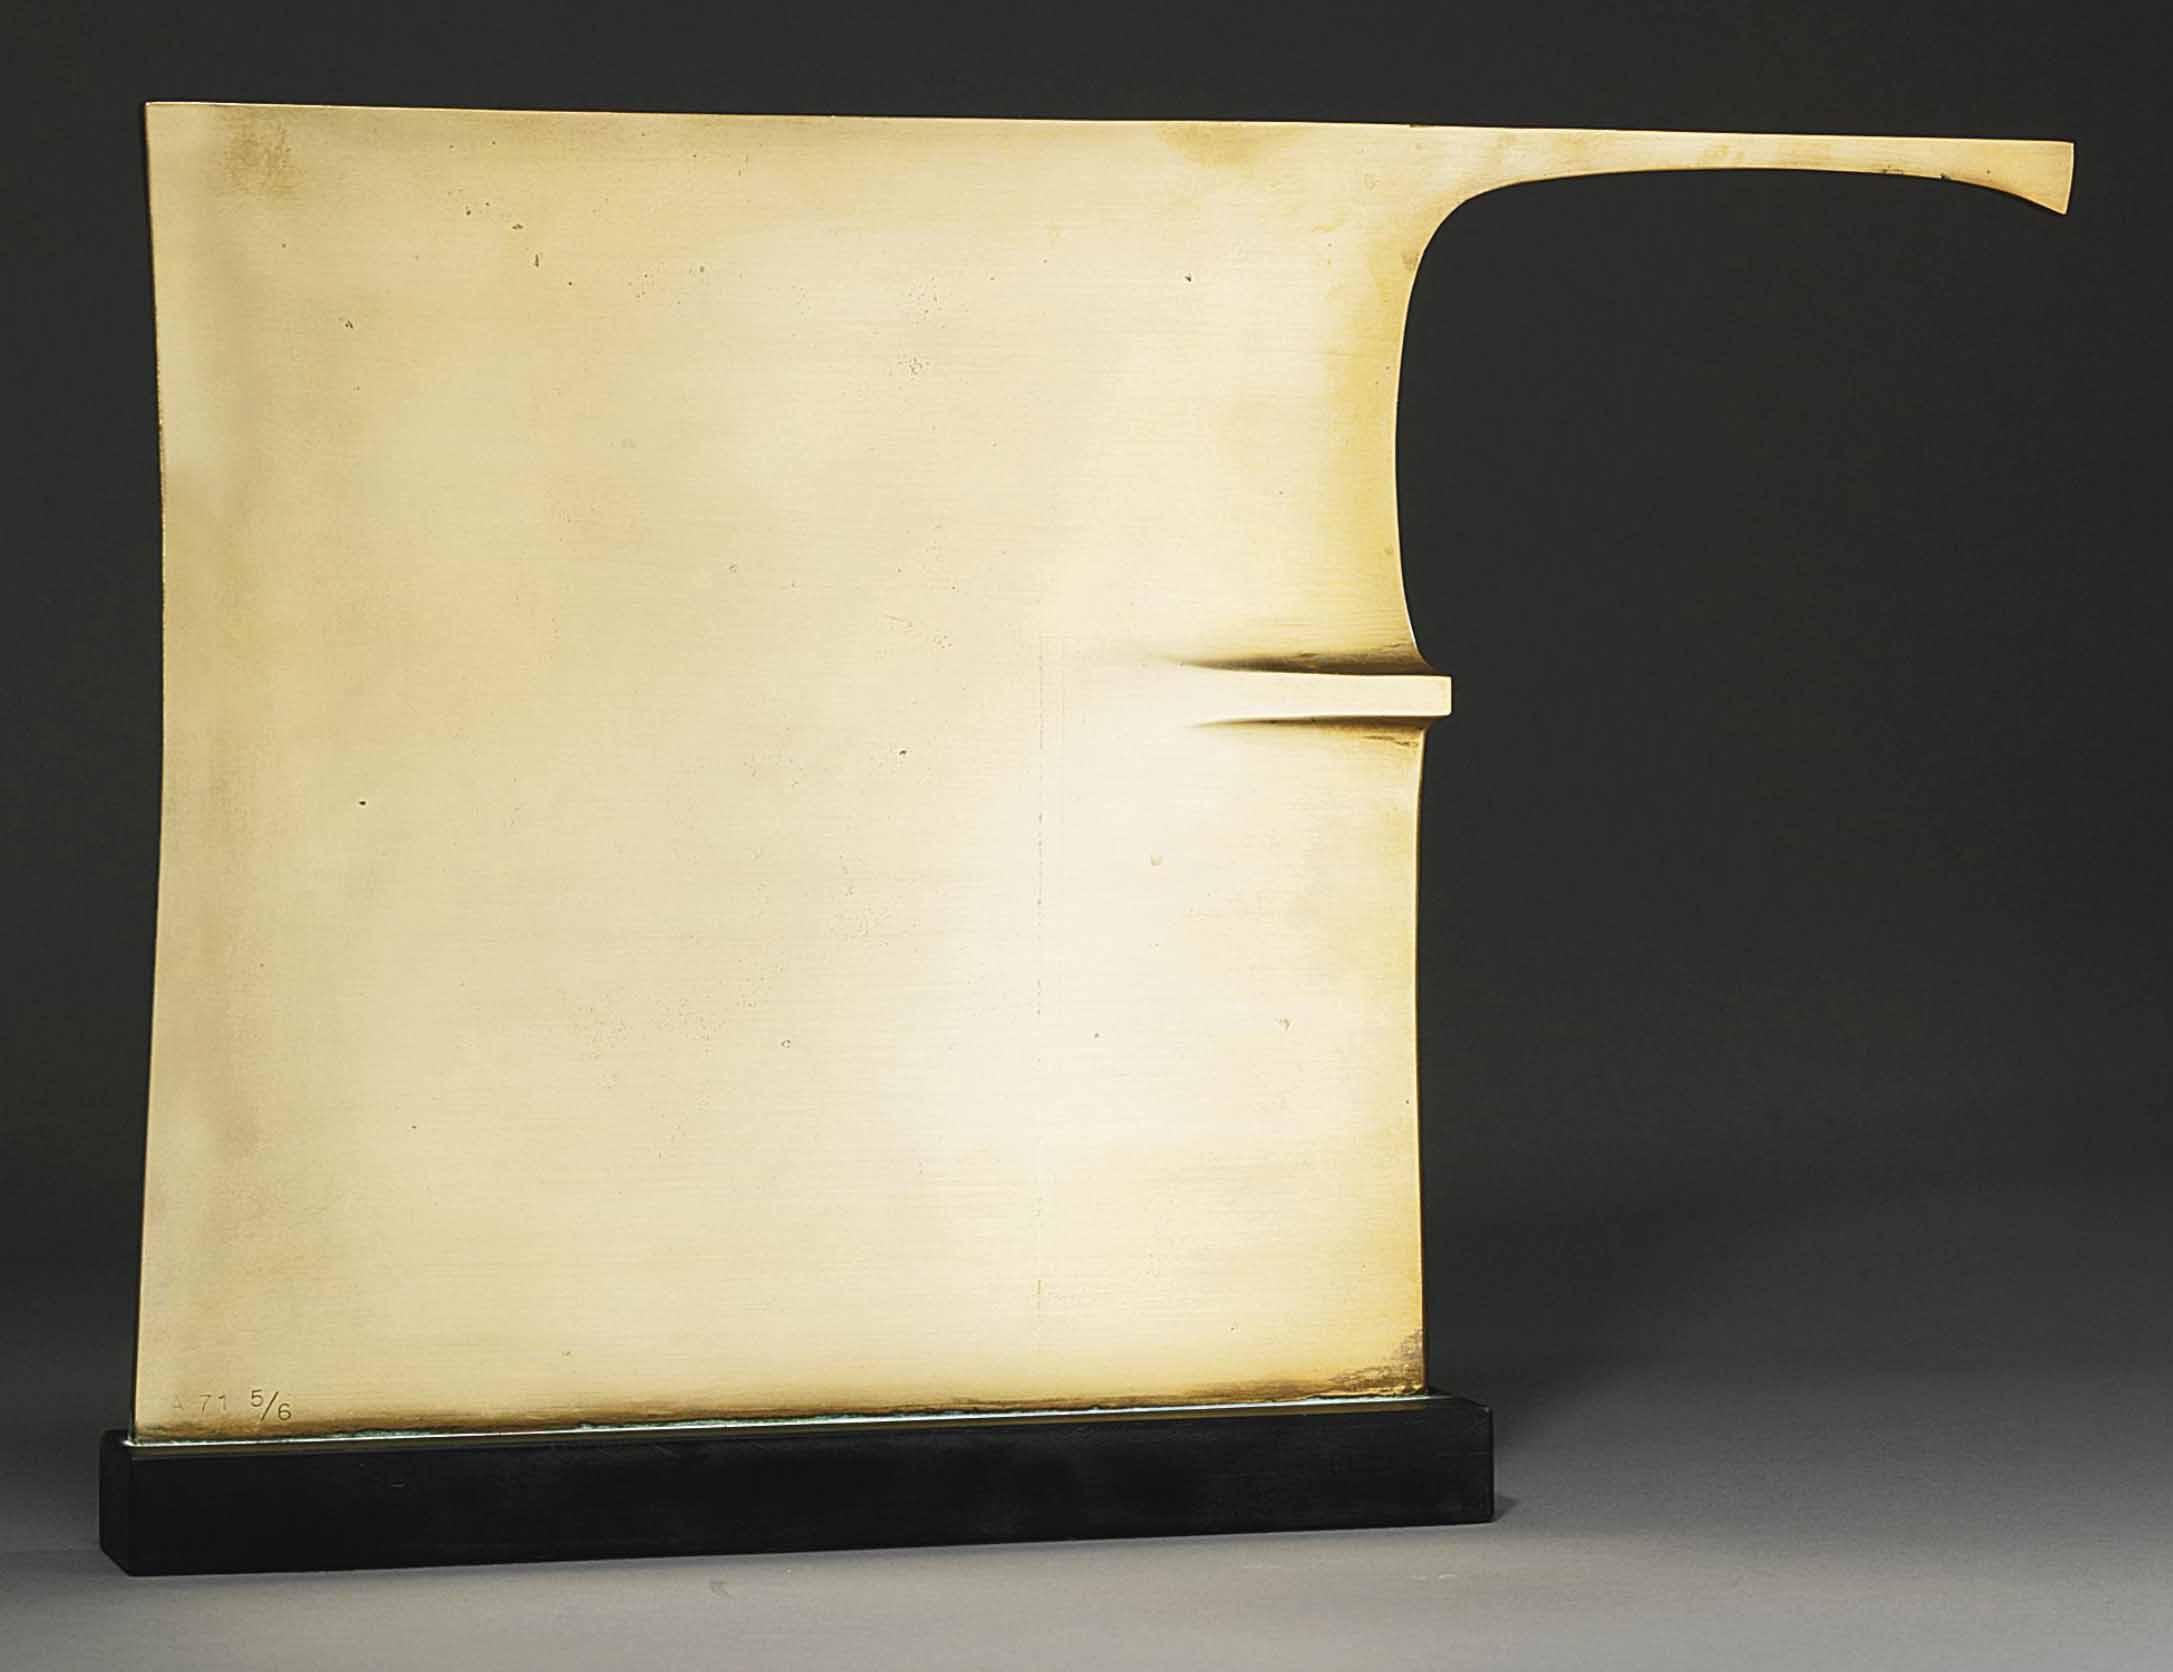 Slim bronze/Hatchet form